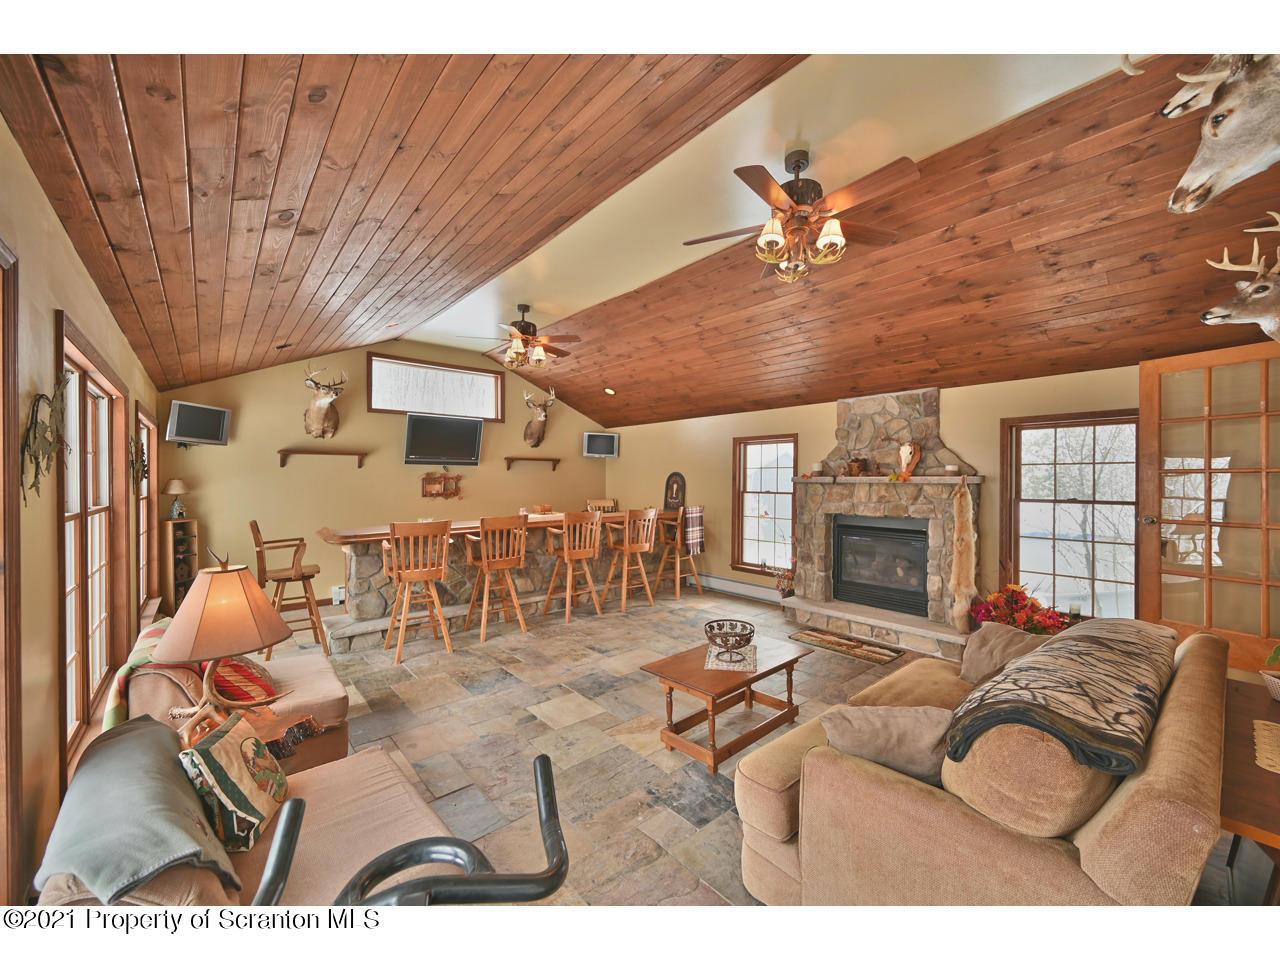 323 Fallbrook Rd, Fell Twp, Pennsylvania 18407, 4 Bedrooms Bedrooms, 10 Rooms Rooms,4 BathroomsBathrooms,Single Family,For Sale,Fallbrook,21-32